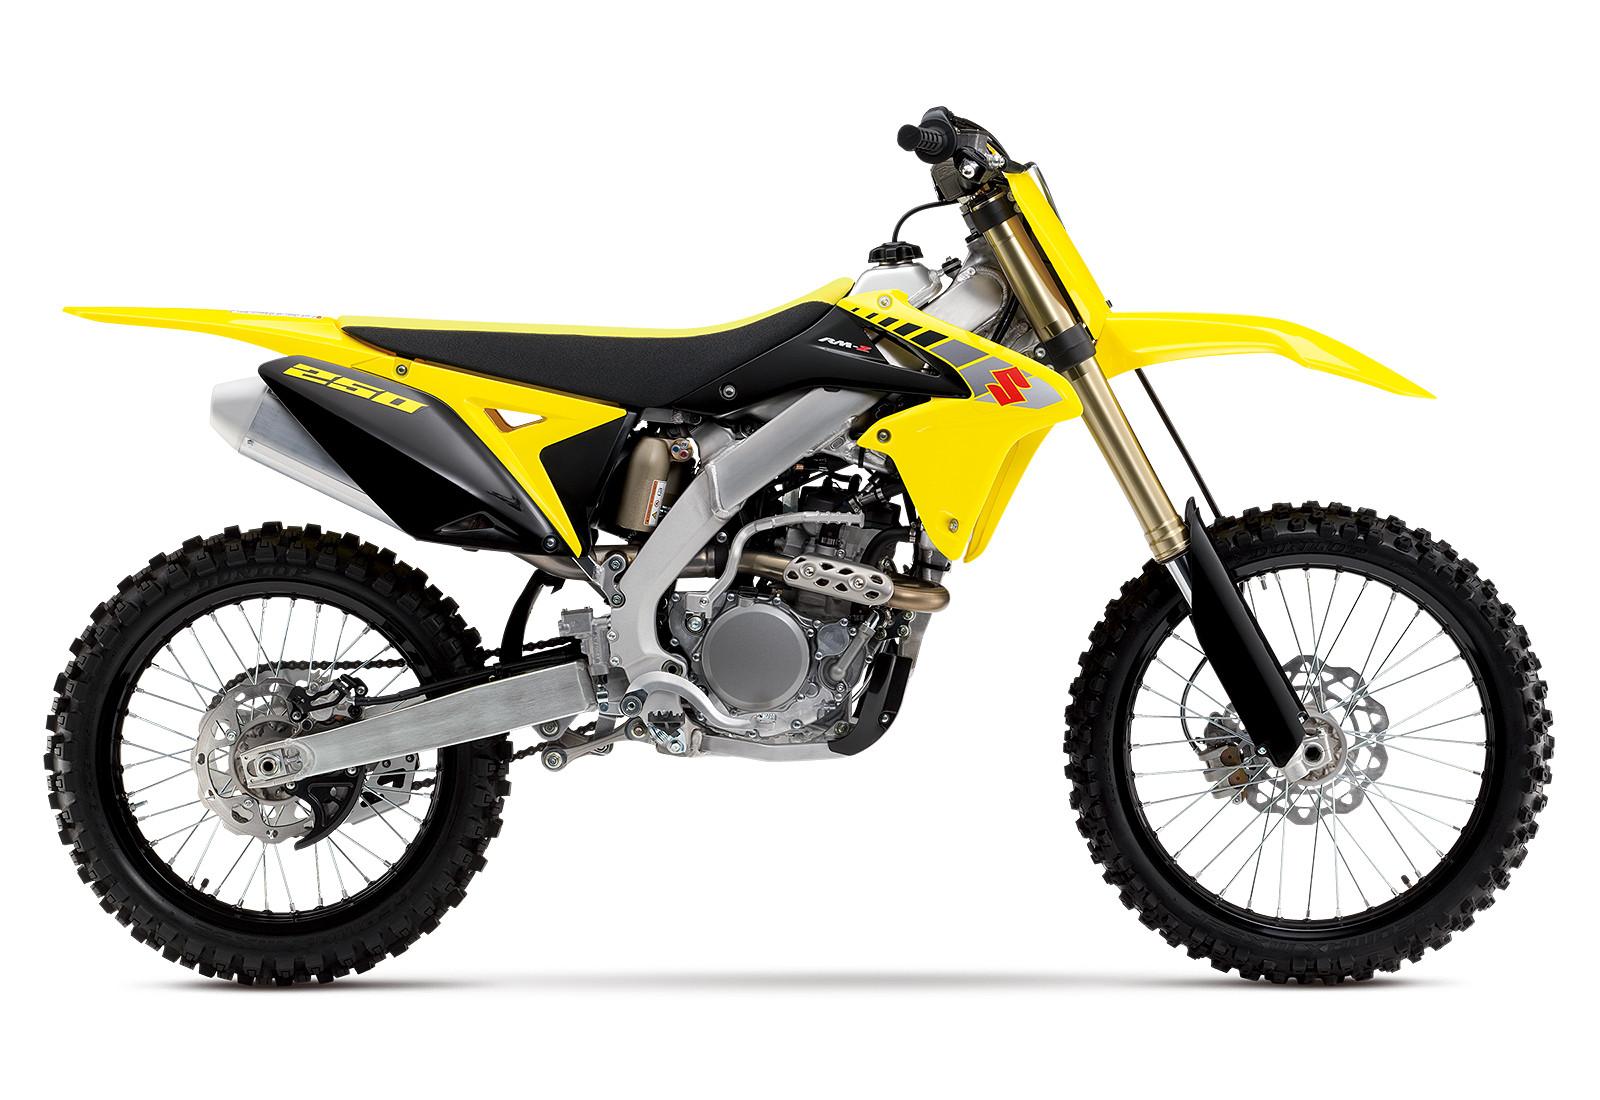 2017 Suzuki RM-Z250 - First Look: 2017 Suzuki RM, RM-Z, and RMX Models - Motocross Pictures - Vital MX